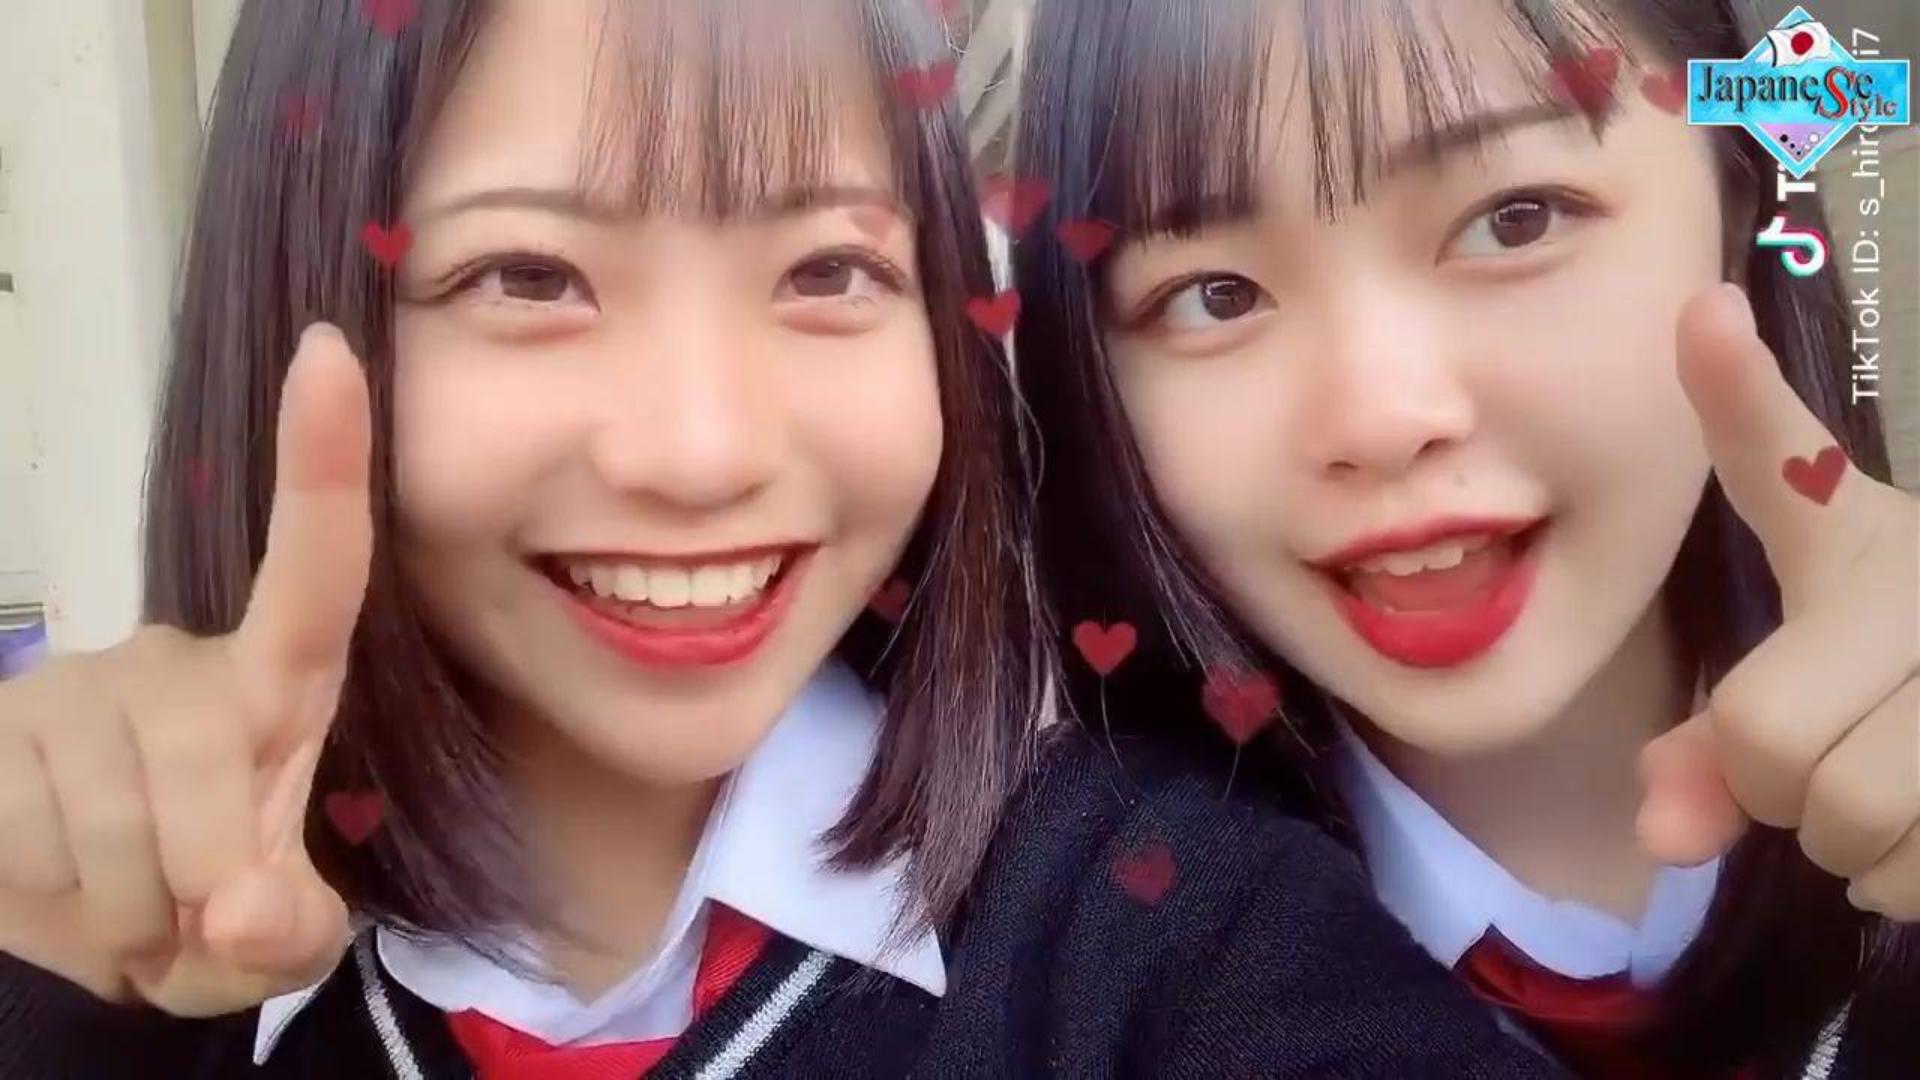 【Tik Tok 精选】日本的高中生活系列 Part14